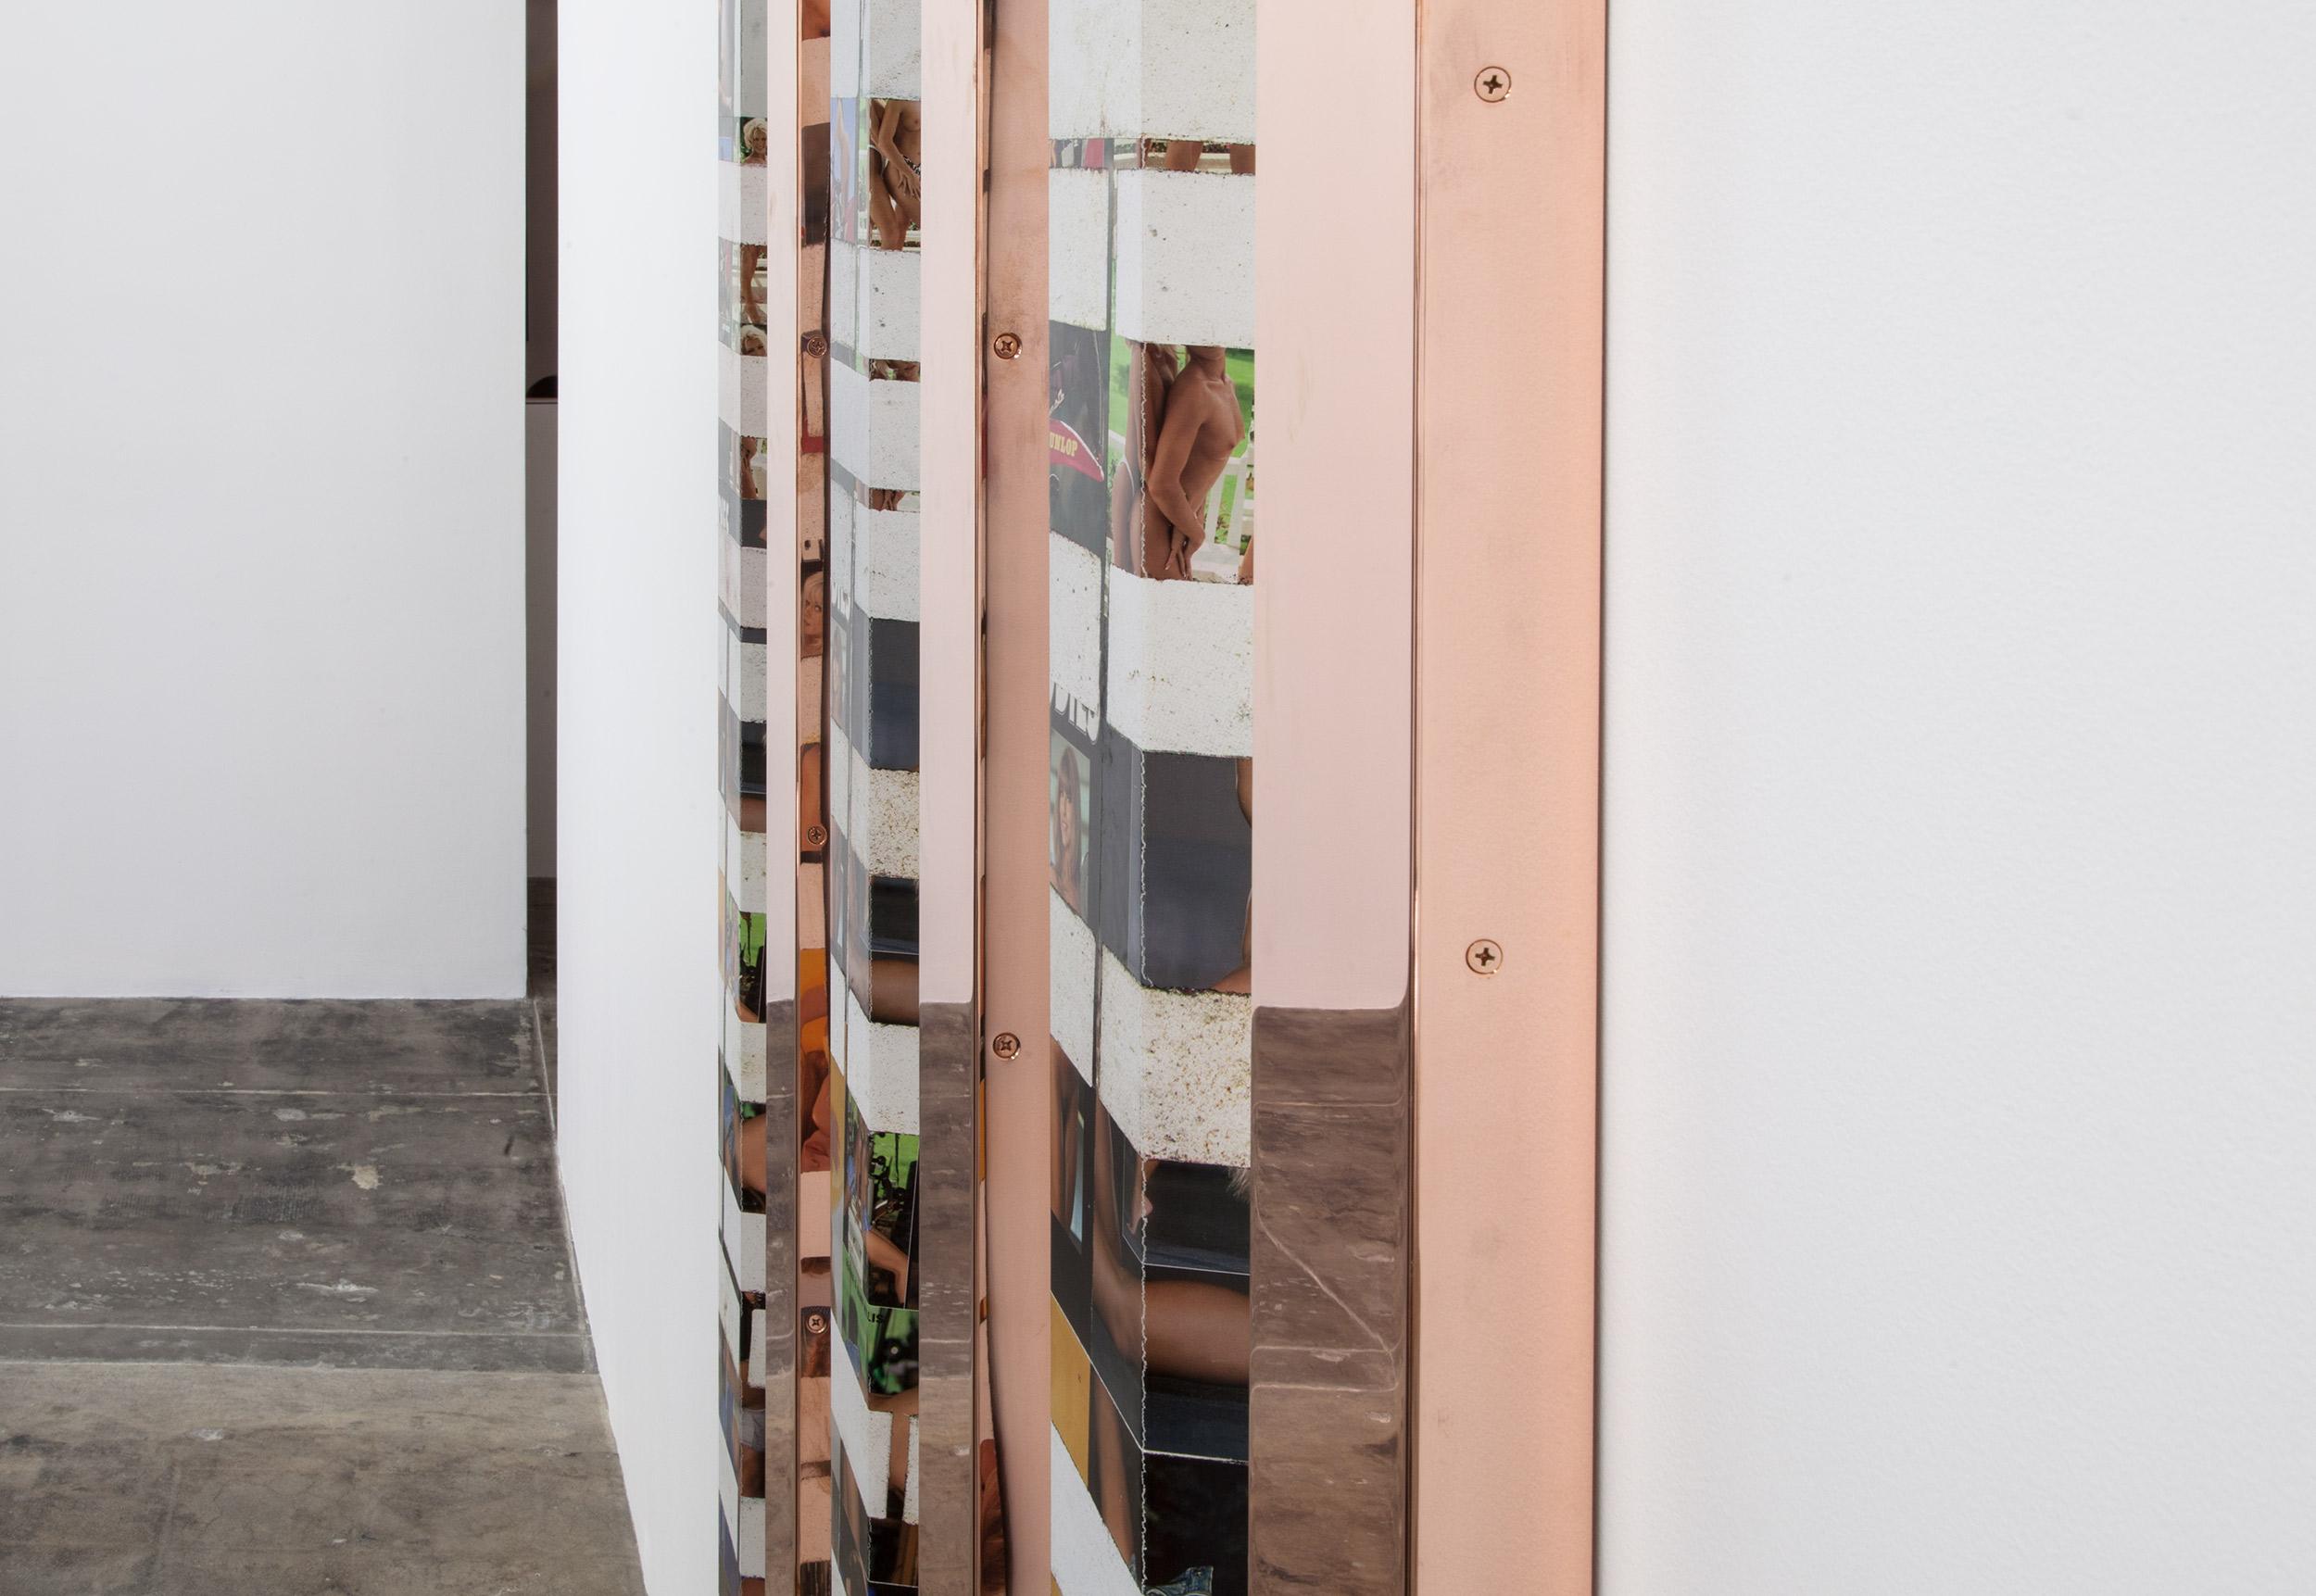 Hardbody Software   With Kelley Walker  Redling Fine Art  Los Angeles  California  2014